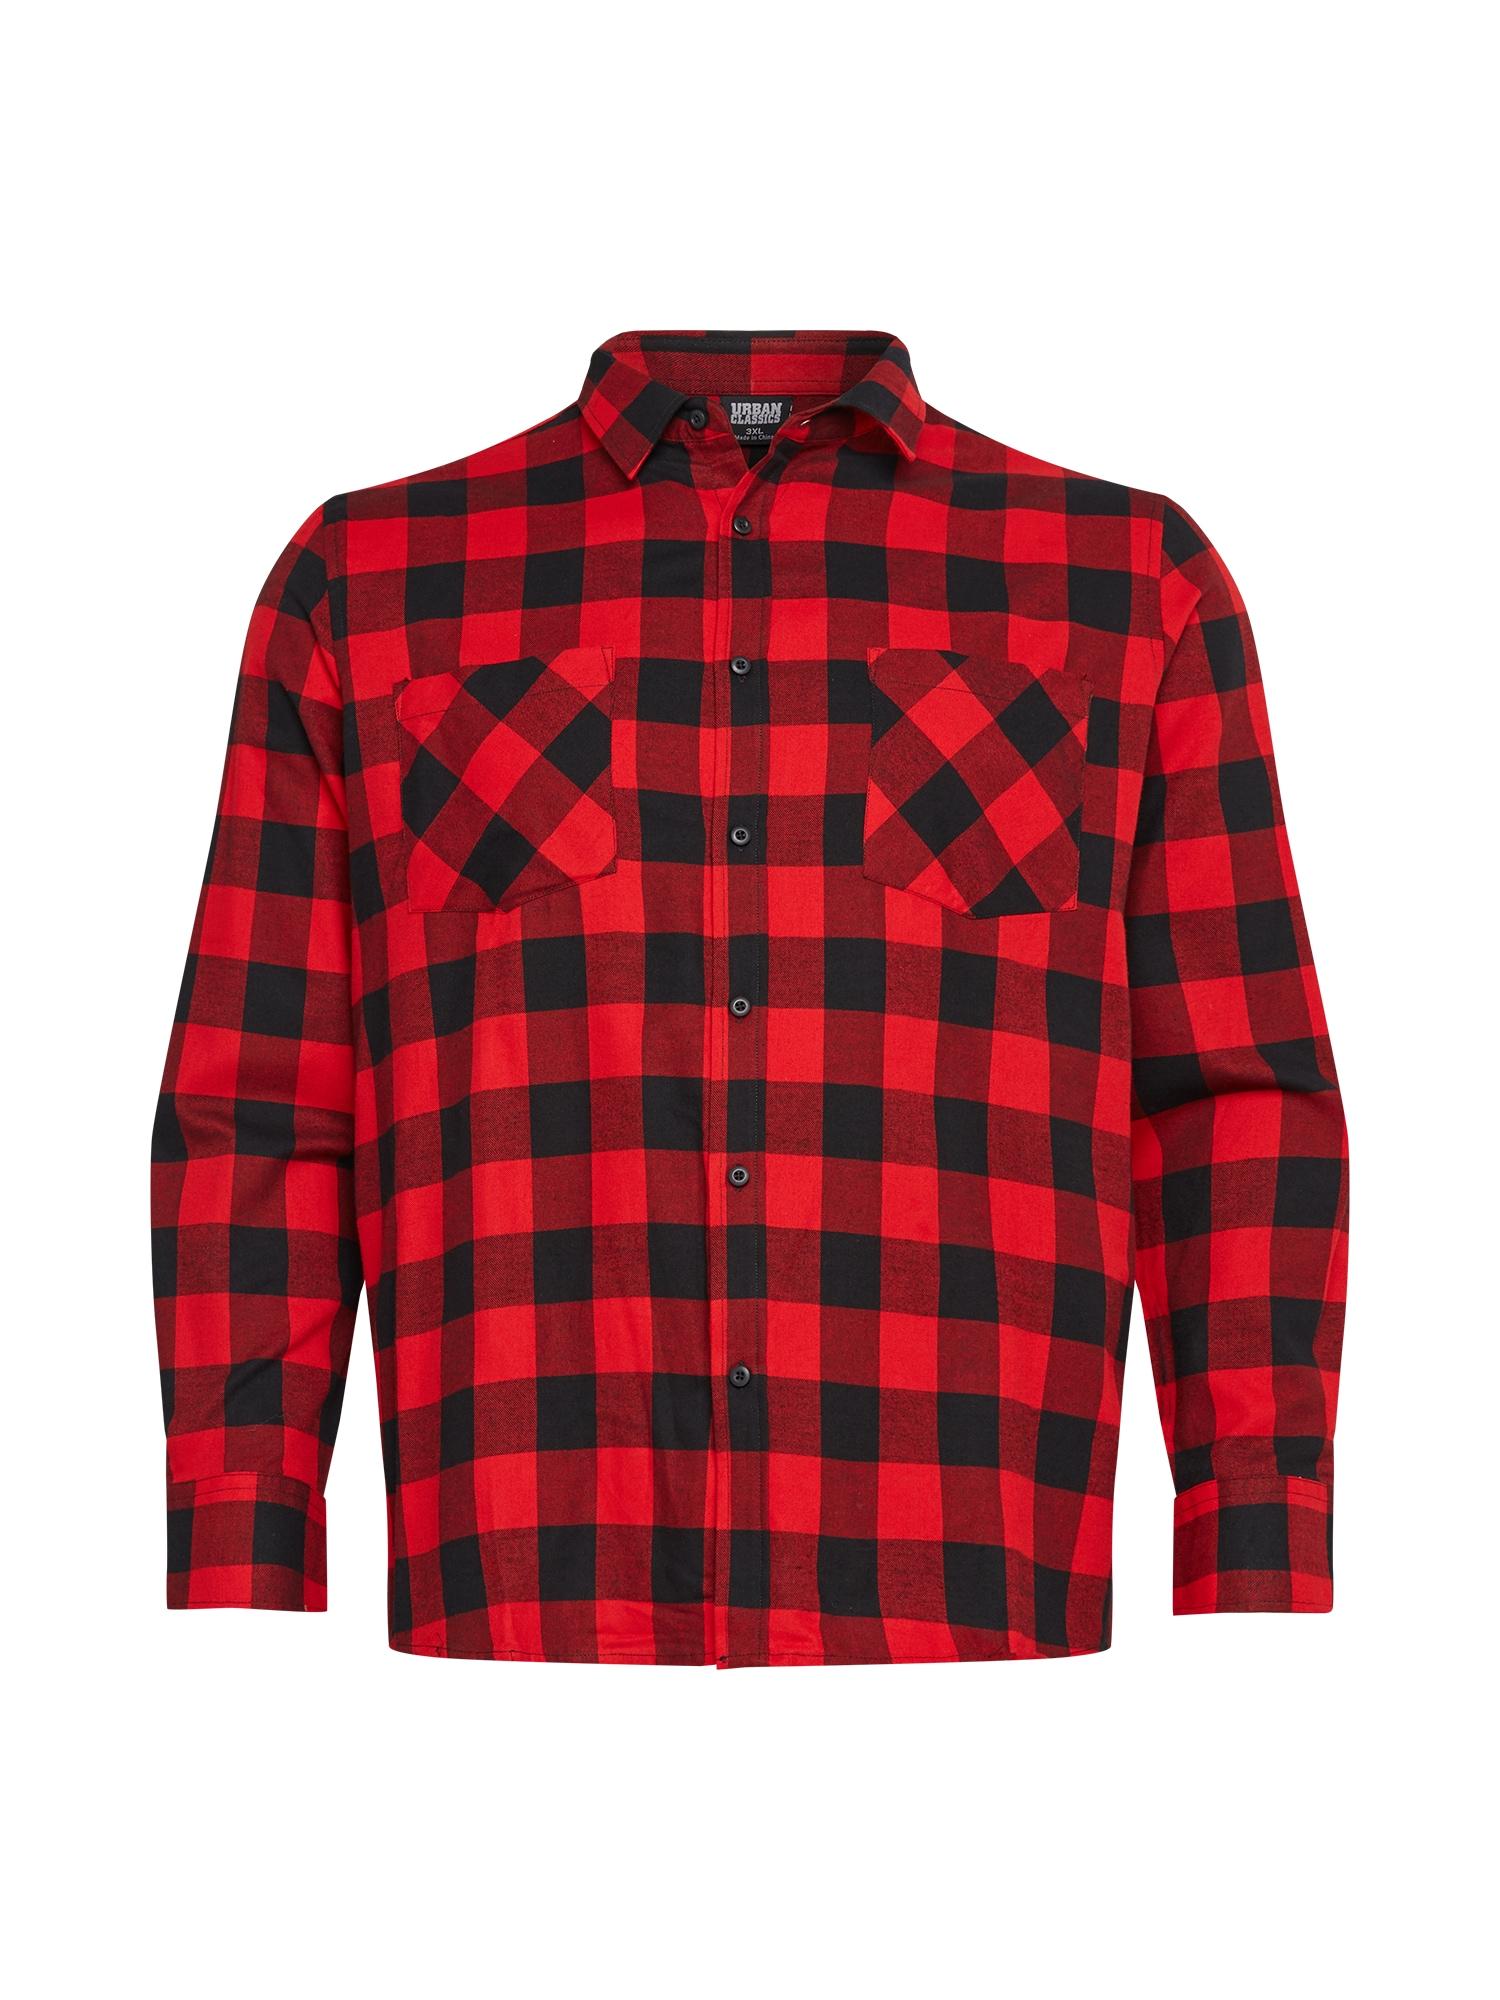 Urban Classics Big & Tall Marškiniai raudona / juoda